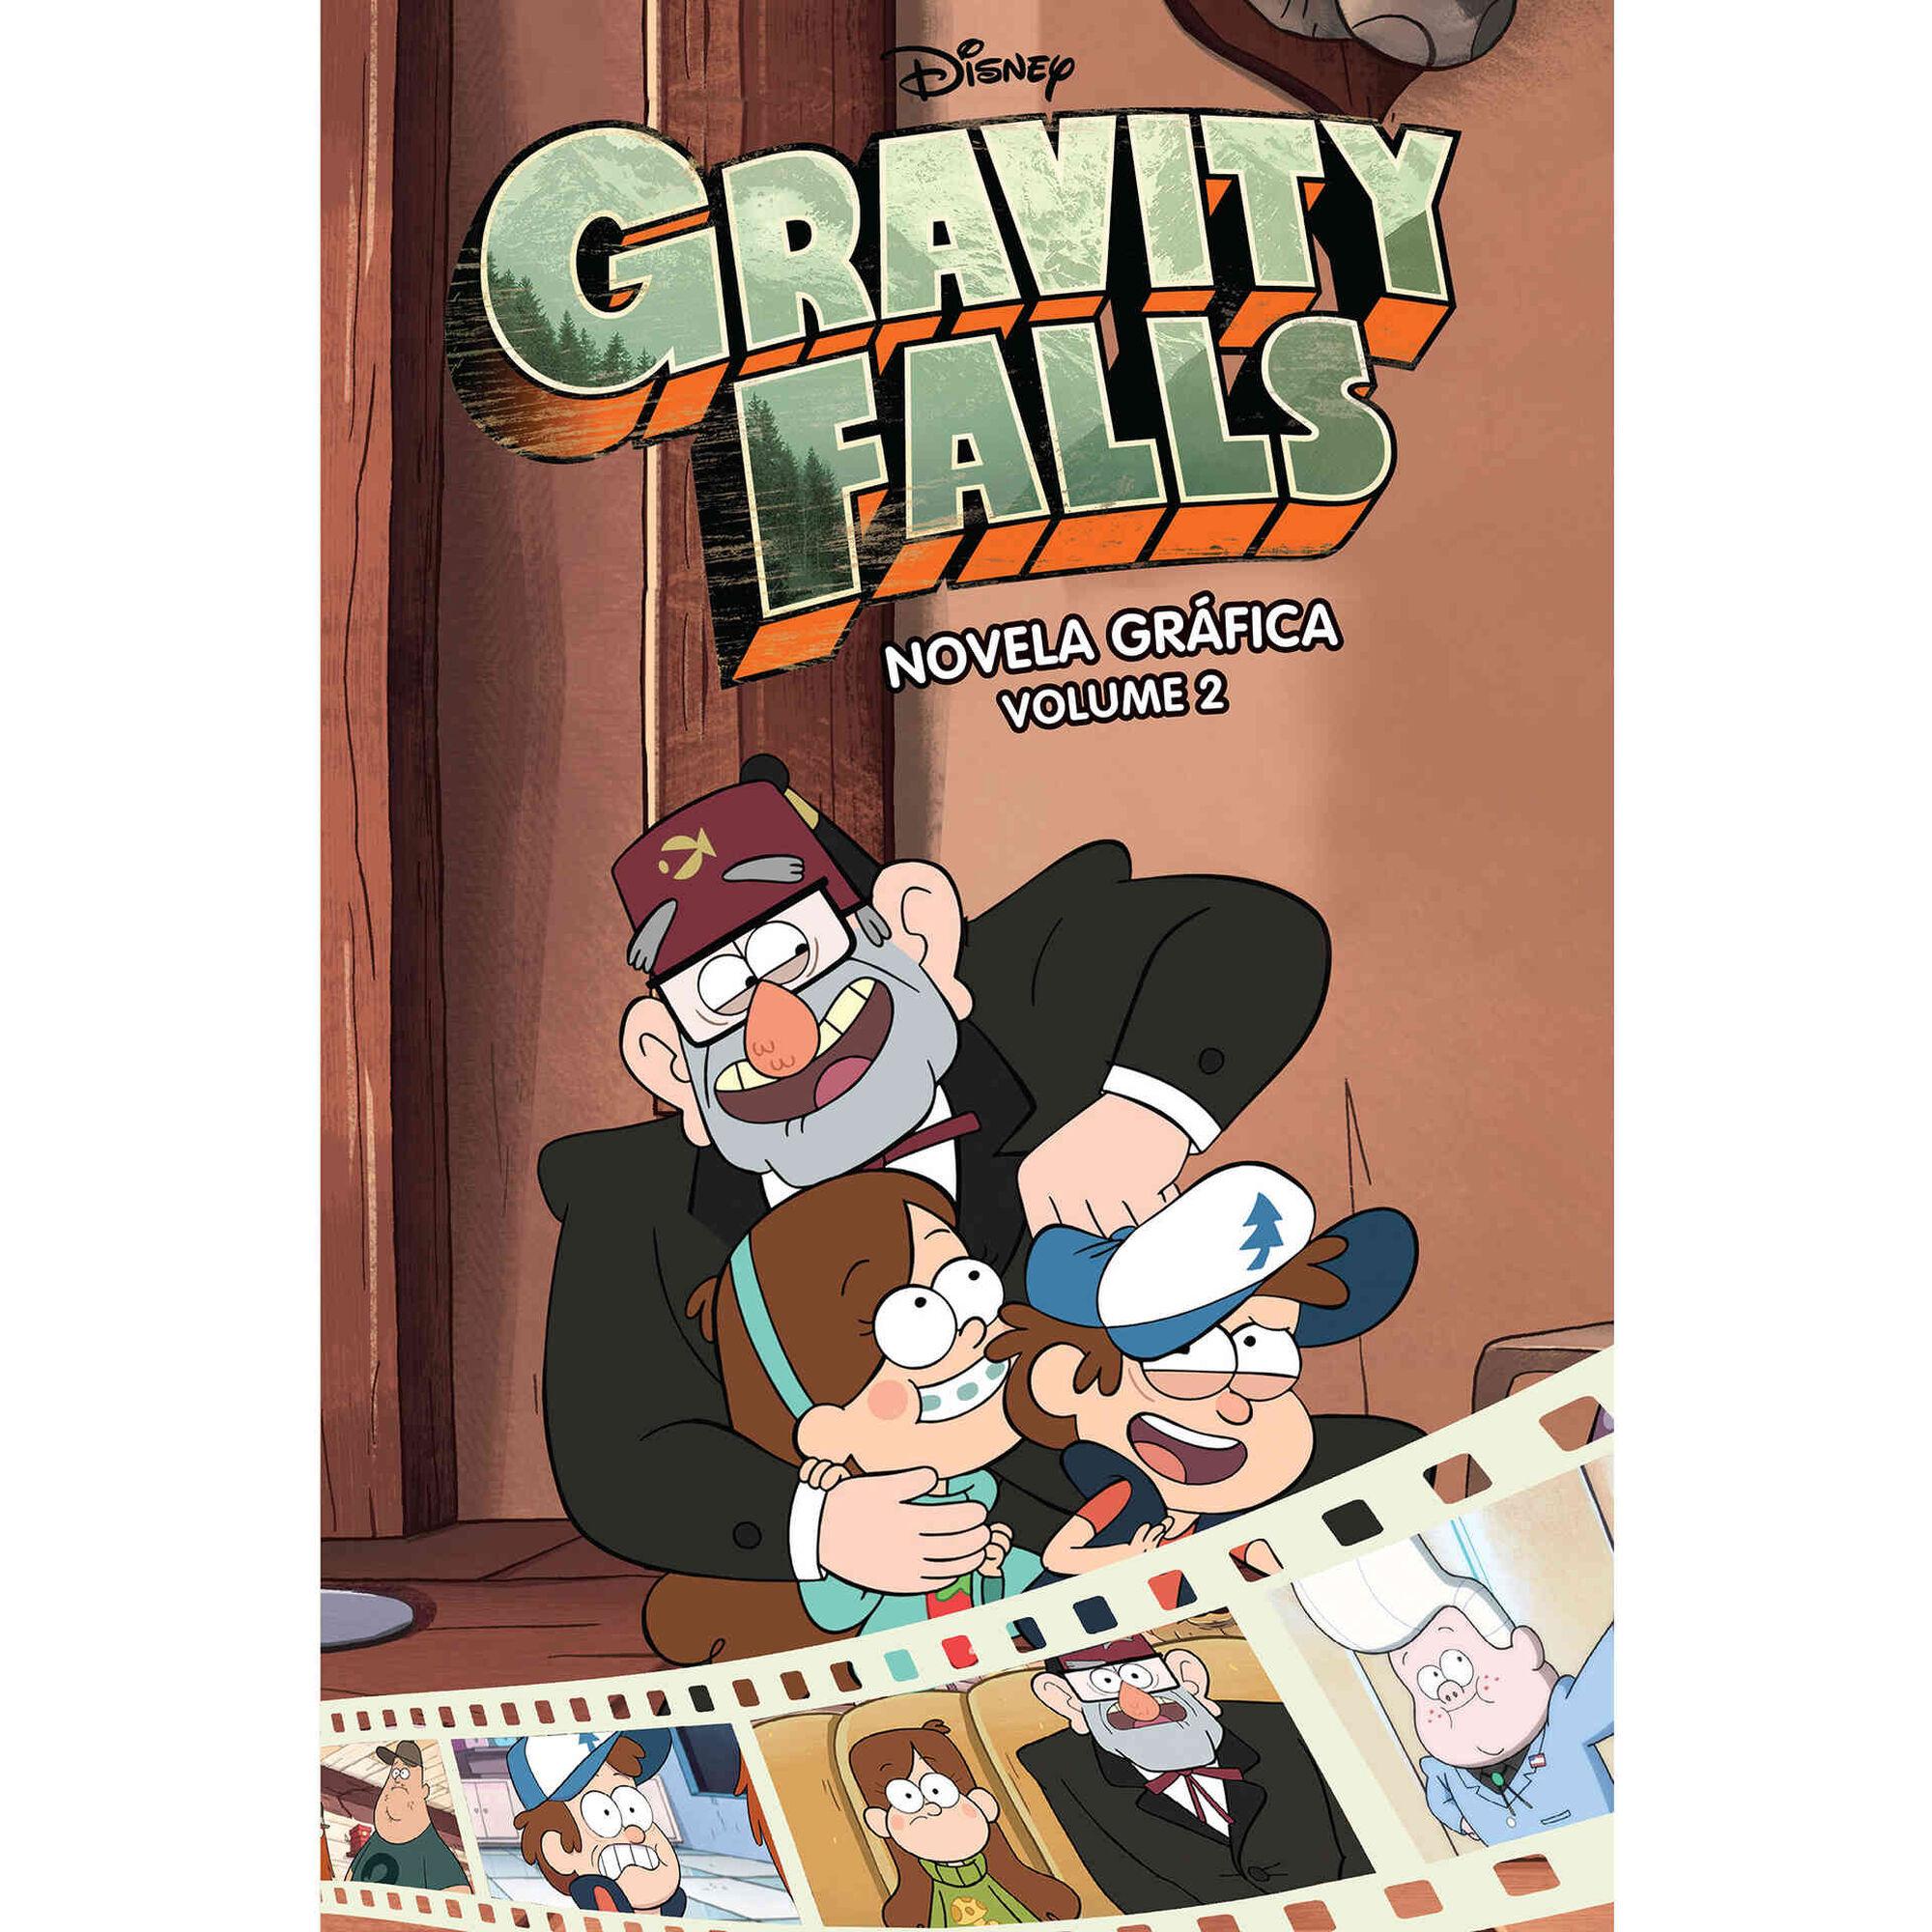 Gravity Falls - Novela Gráfica (volume 2)